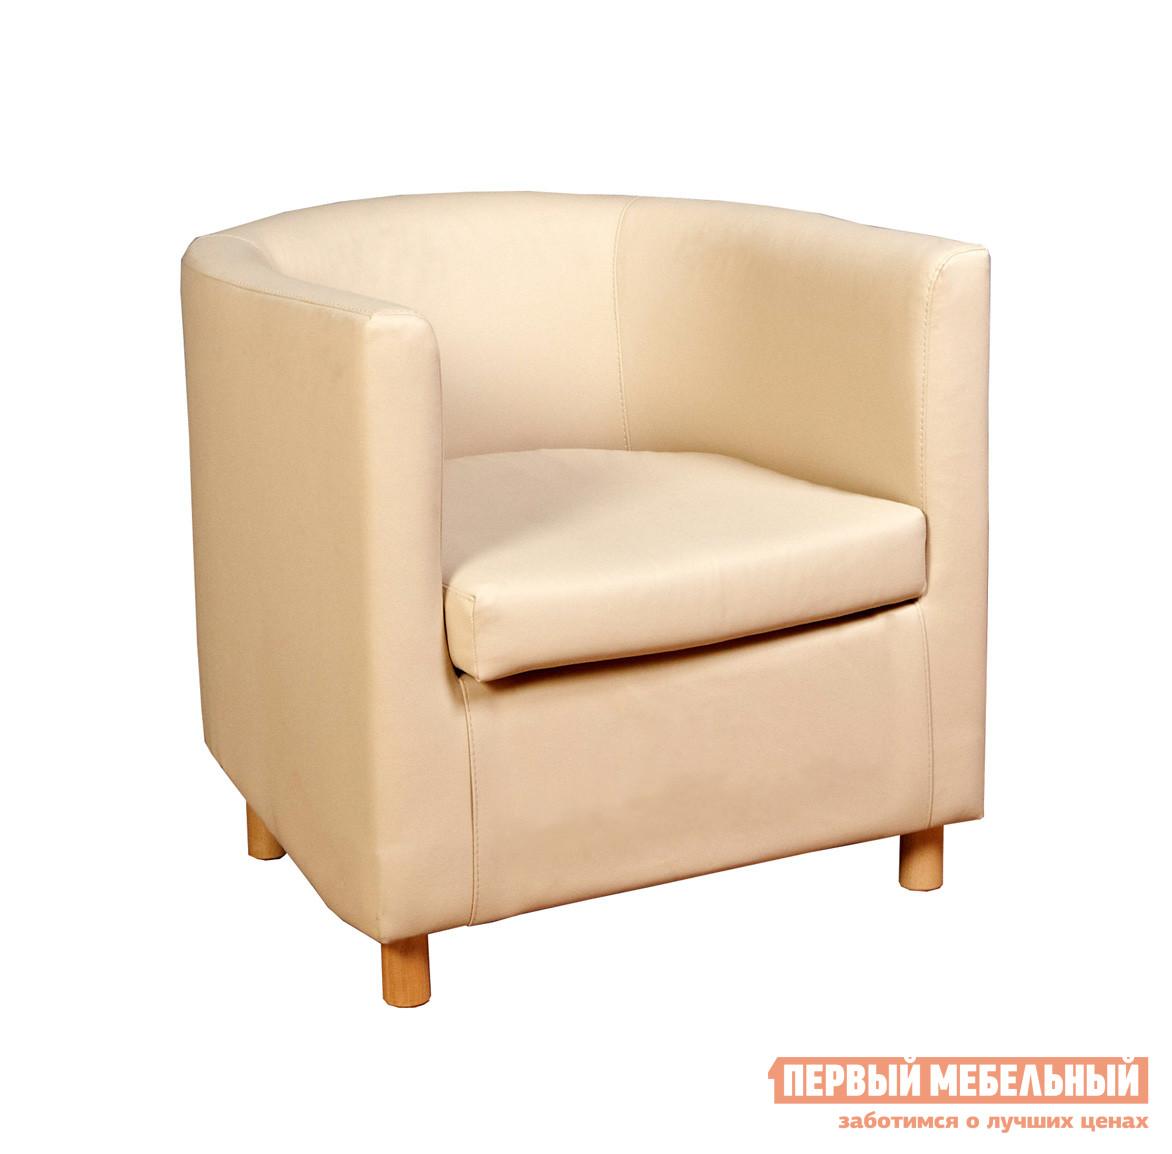 Кресло СМК Дисо 3 042.08 1х К/з Орегон 3023 от Купистол